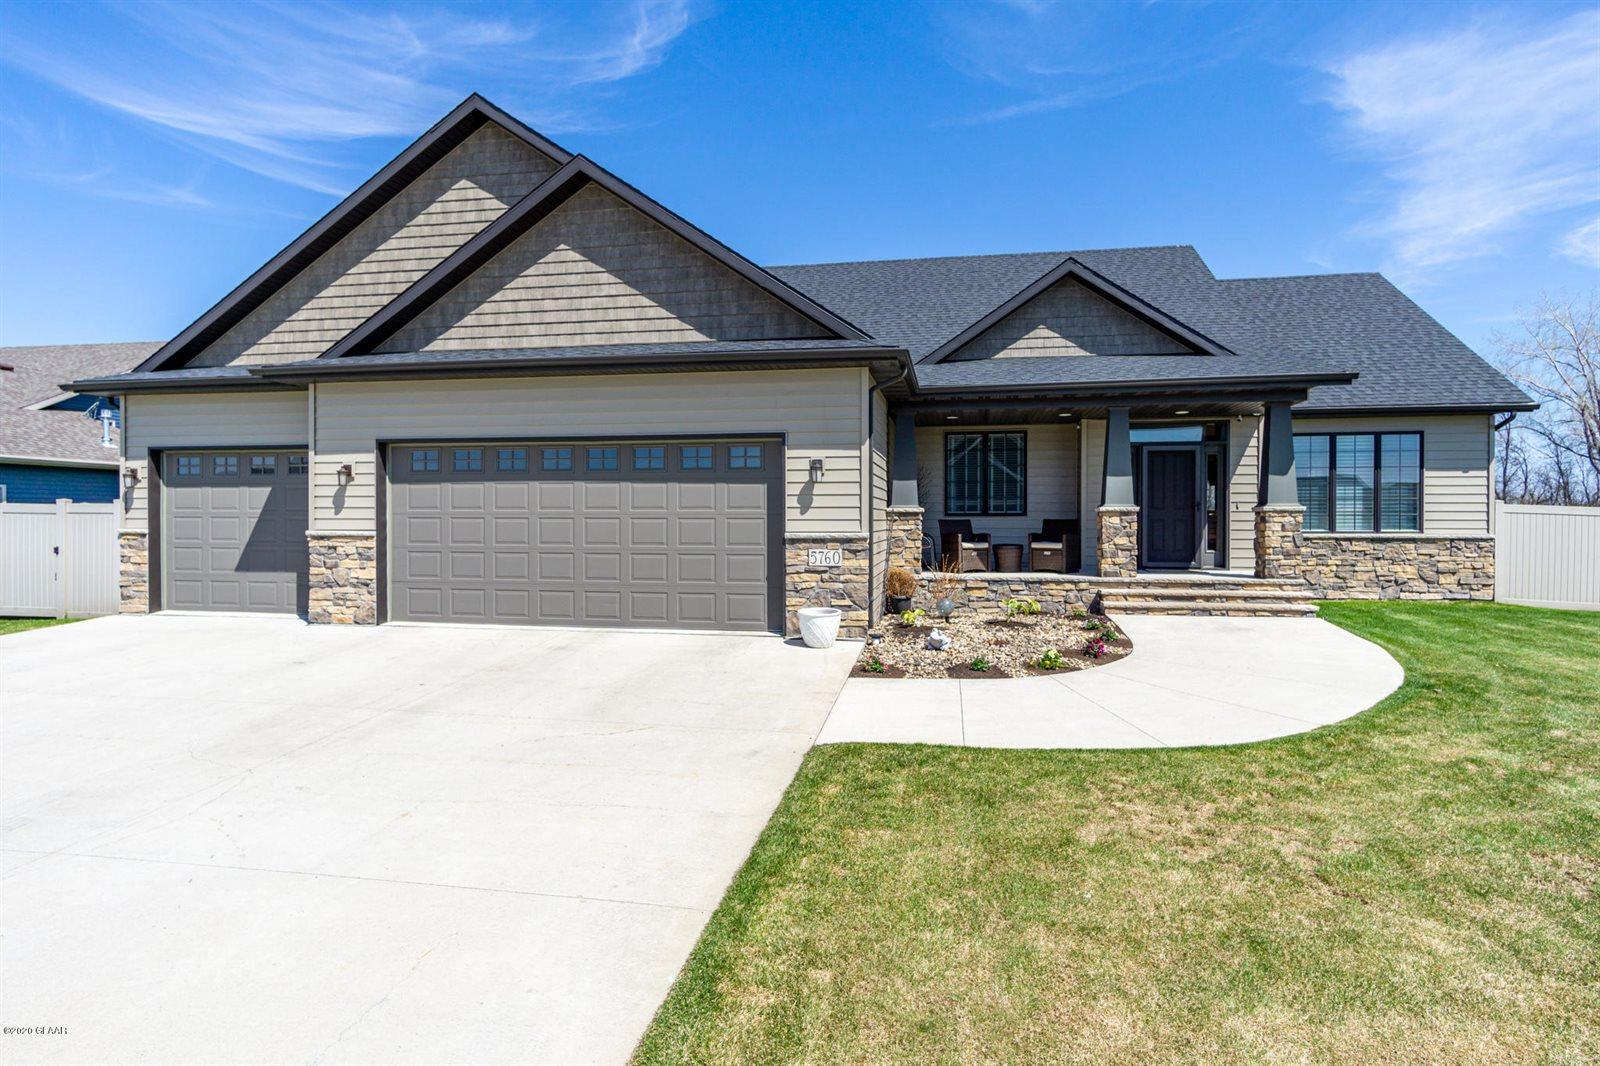 5760 East Prairiewood Dr, Grand Forks, ND 58201